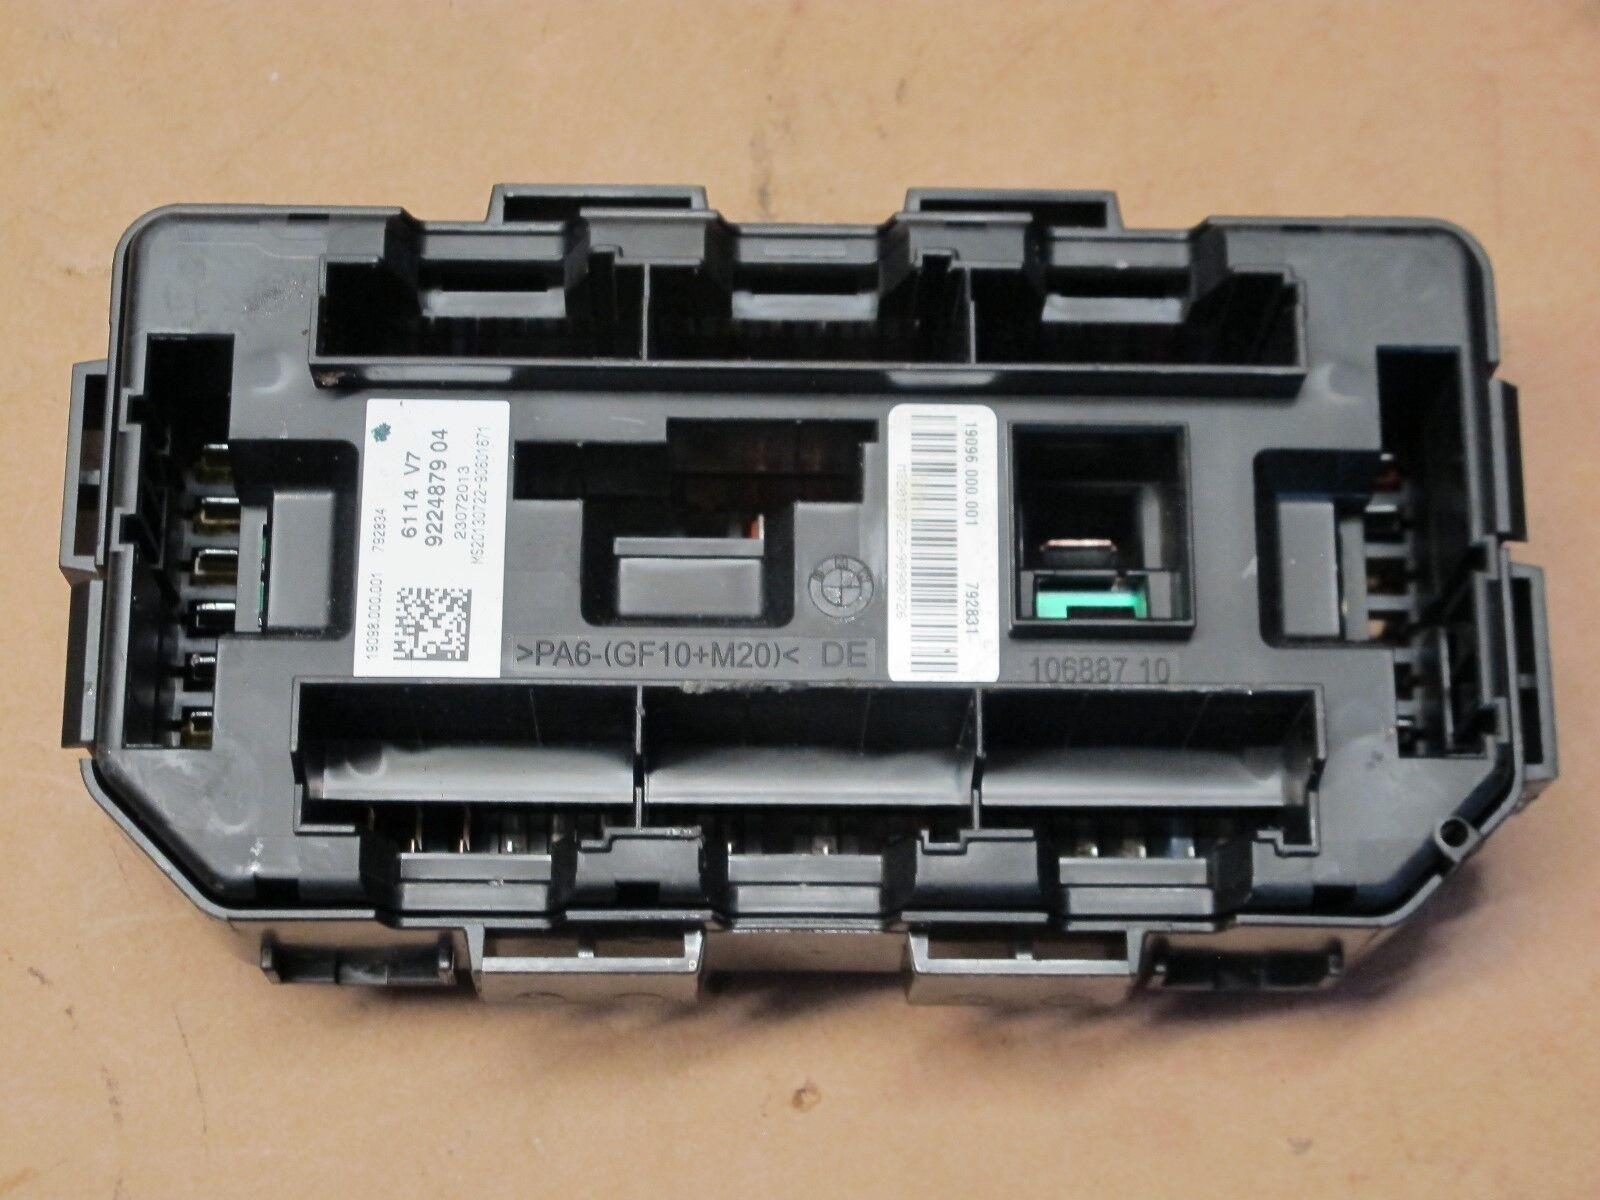 Bmw E20 E21 E30 E31 1 3 Series Fuse Box 61149224879 9224879 Repair 2 Of